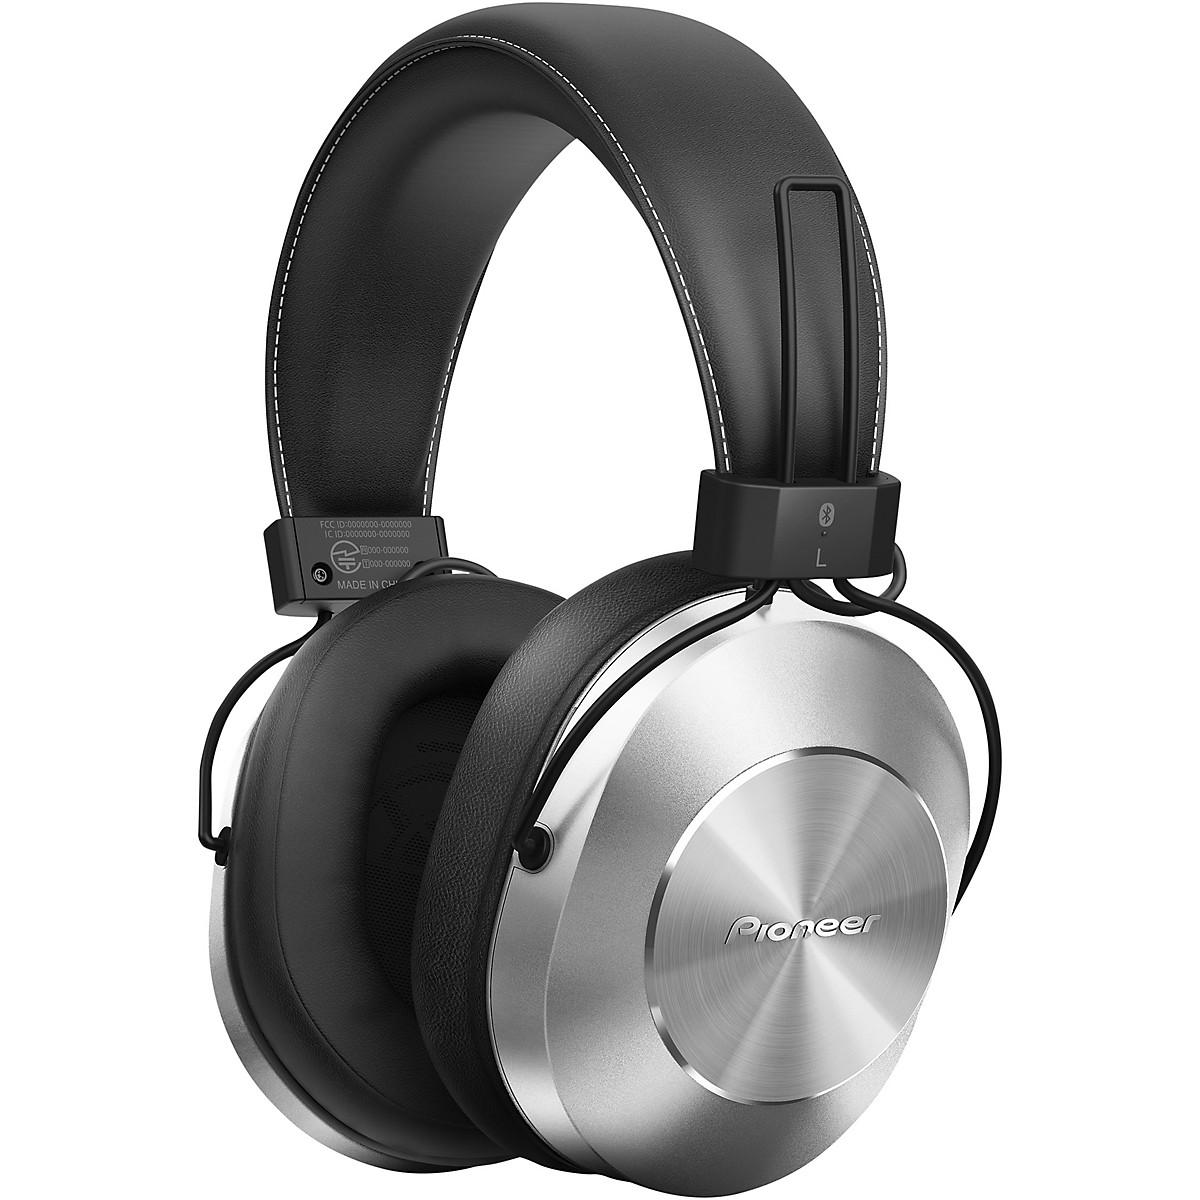 Pioneer SEMS7BTS Wireless/Wired Stereo Headphones